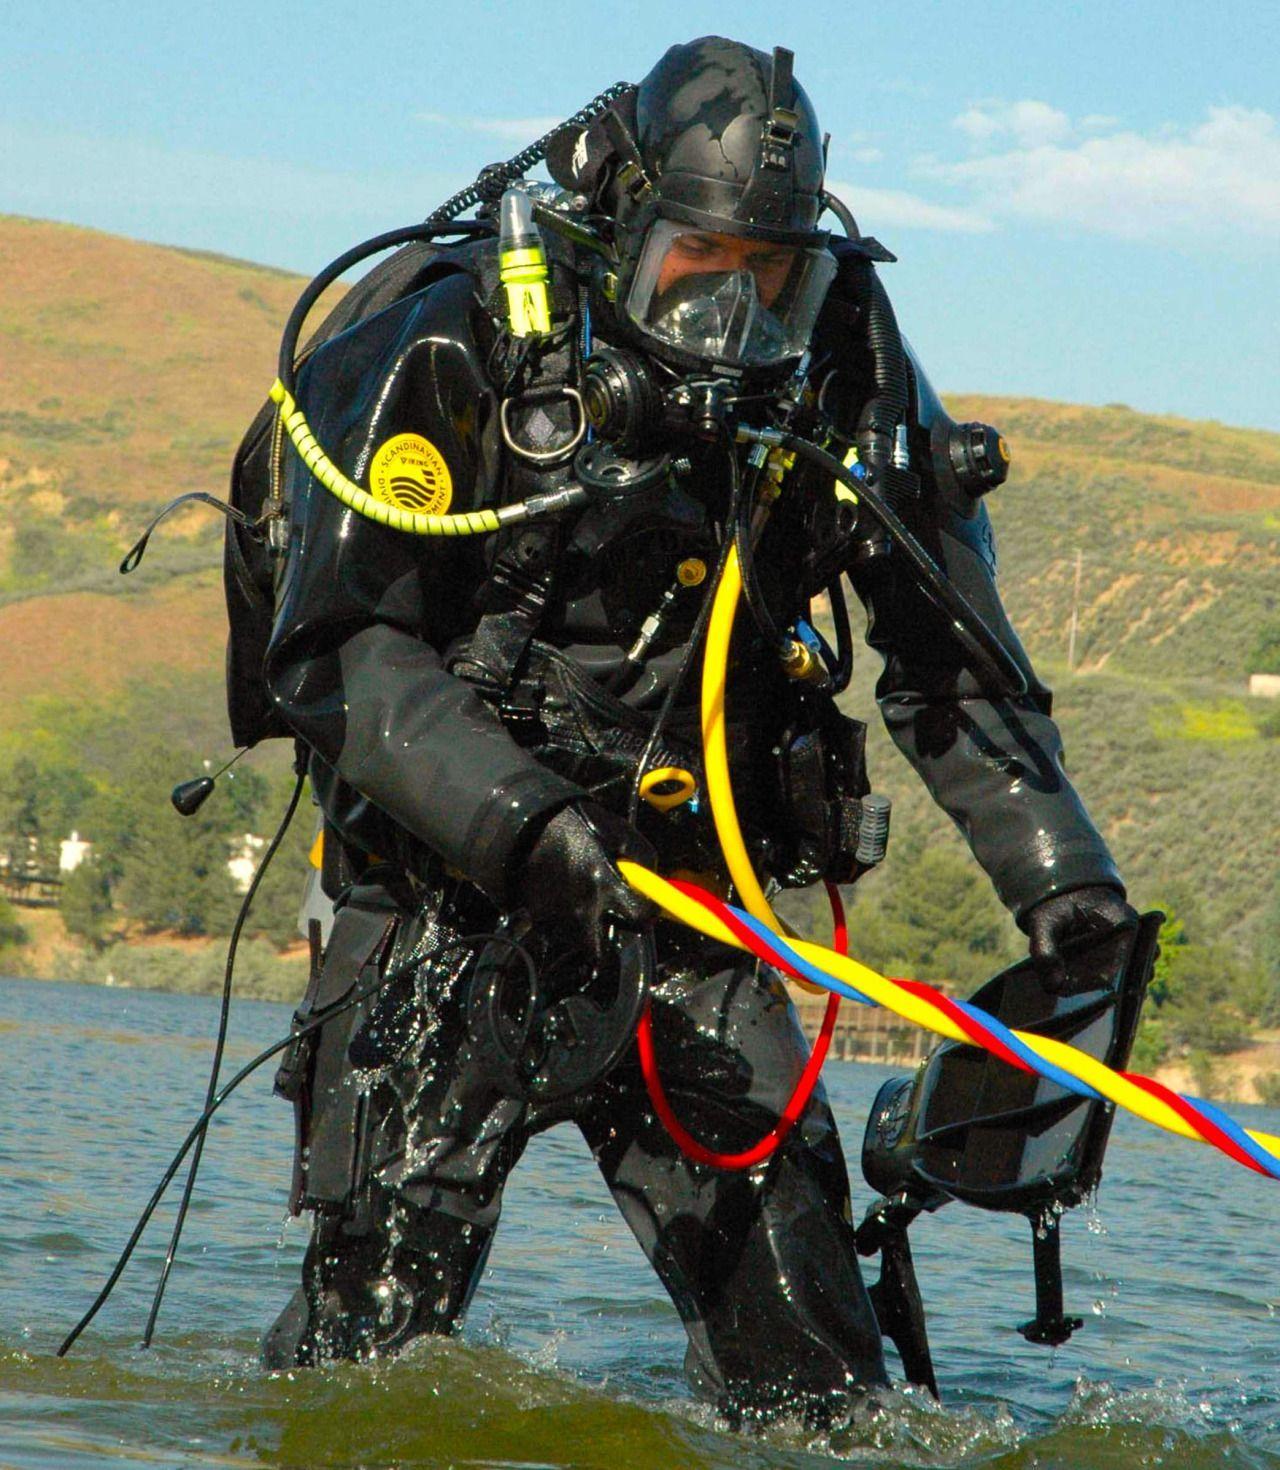 Http Www Deepbluediving Org Best Dive Watches Kfdgroupcommercialdivingequipment Scuba Diving Tank Scuba Diving Equipment Diving Gear